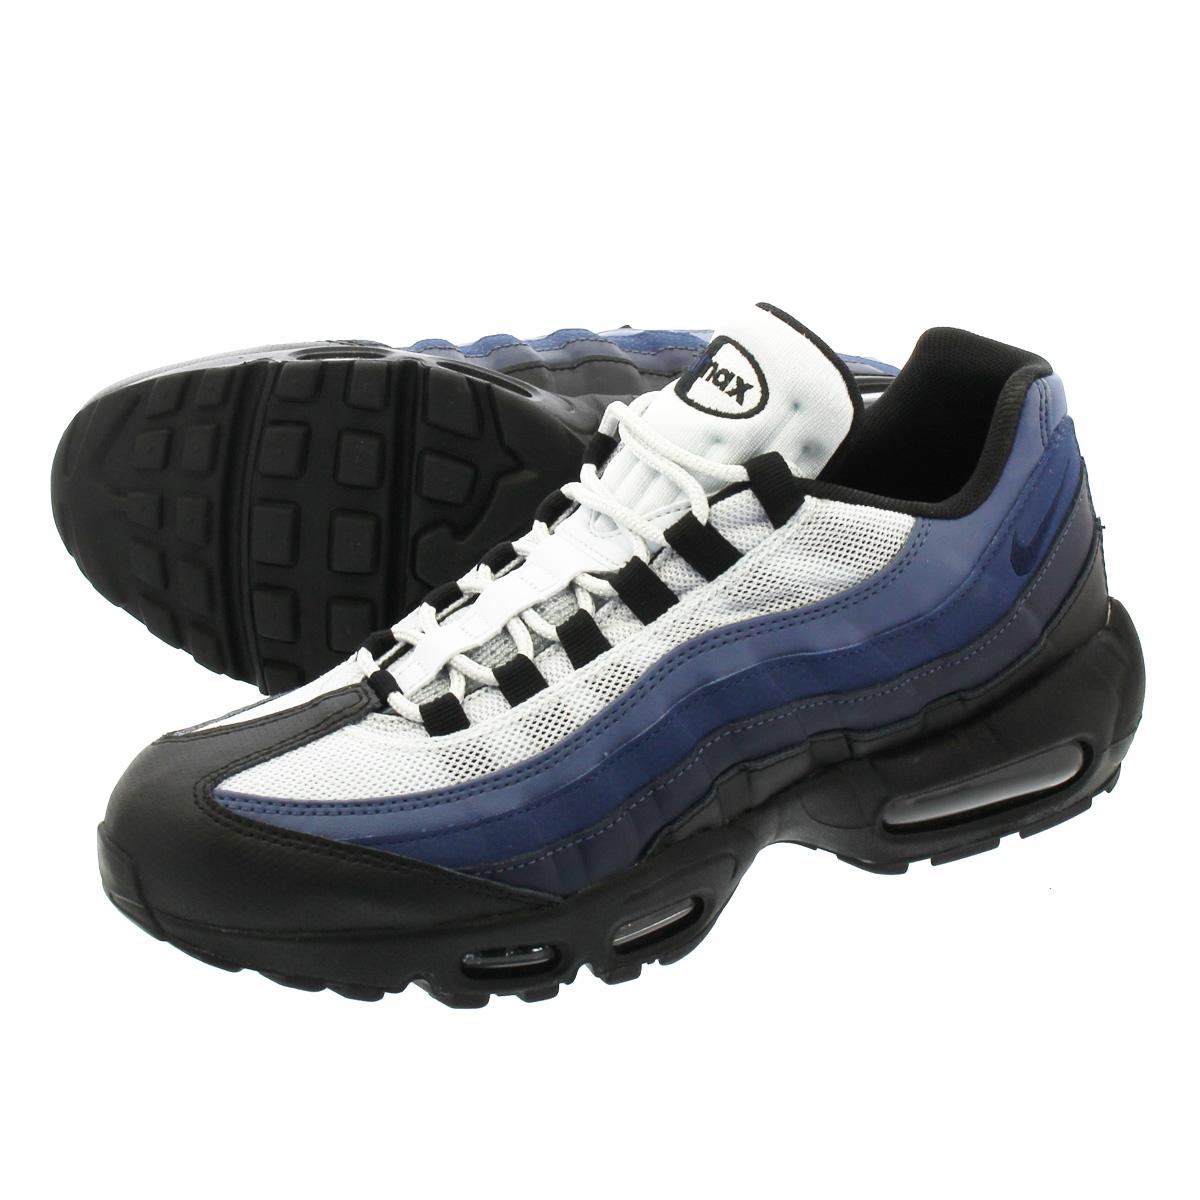 nike air max 95 navy blue black